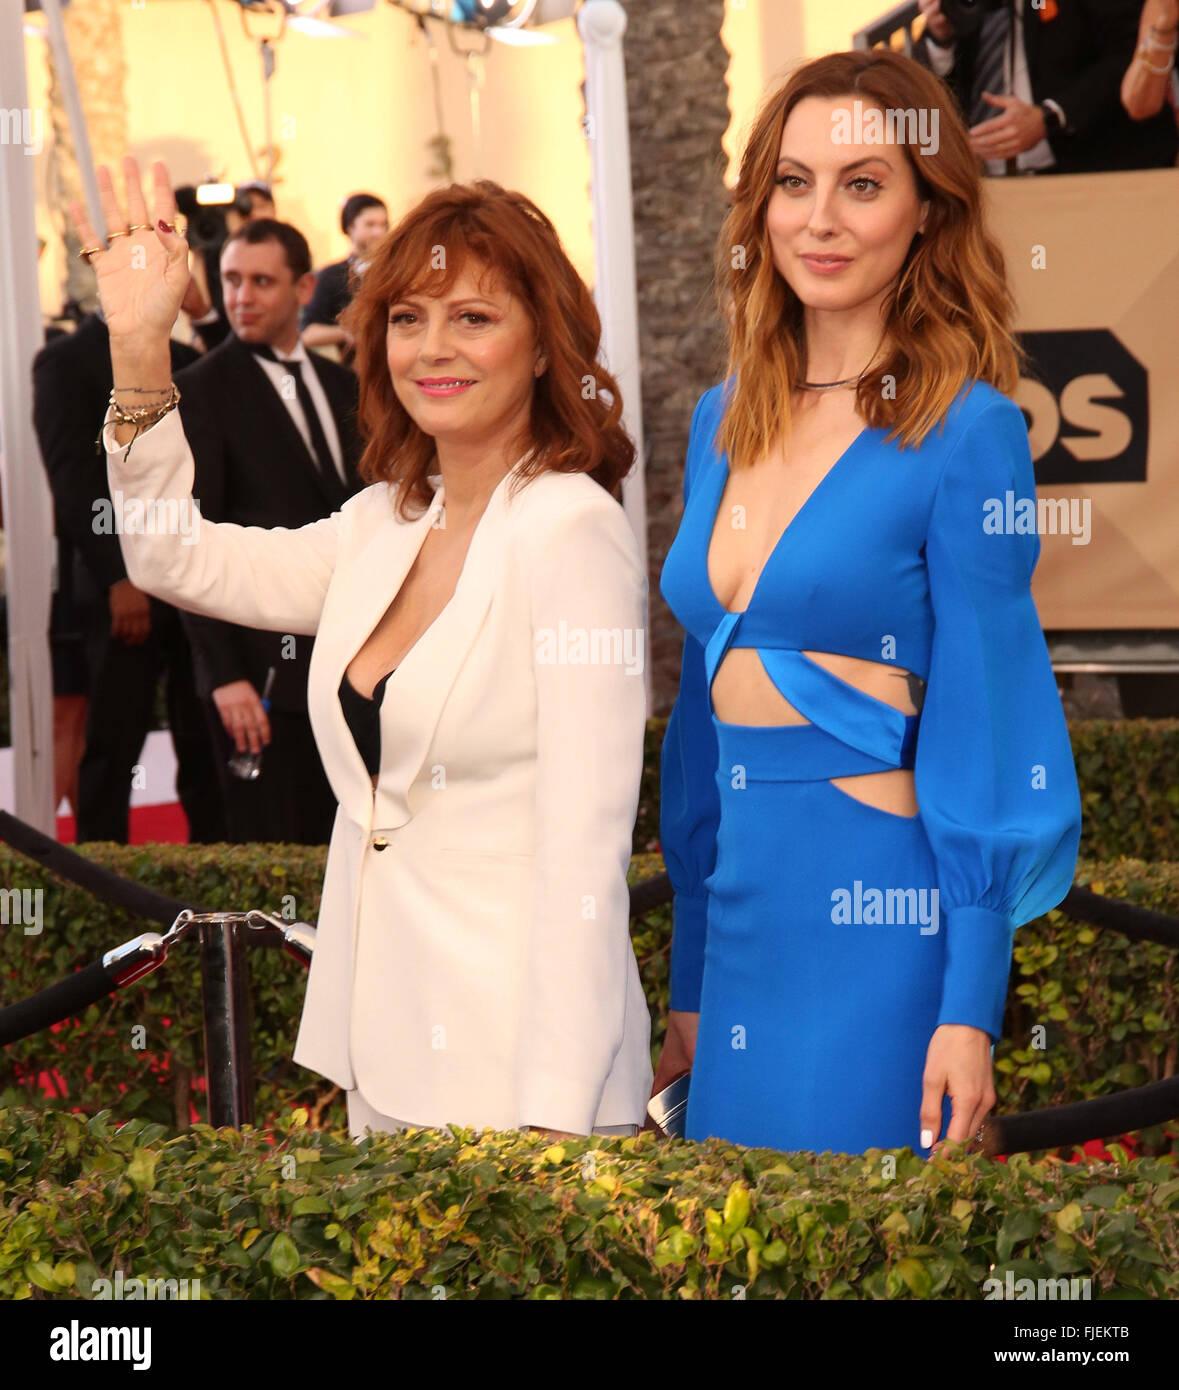 22nd Annual Screen Actors Guild Awards at The Shrine Expo Hall - Arrivals  Featuring: Susan Sarandon, Eva Amurri - Stock Image